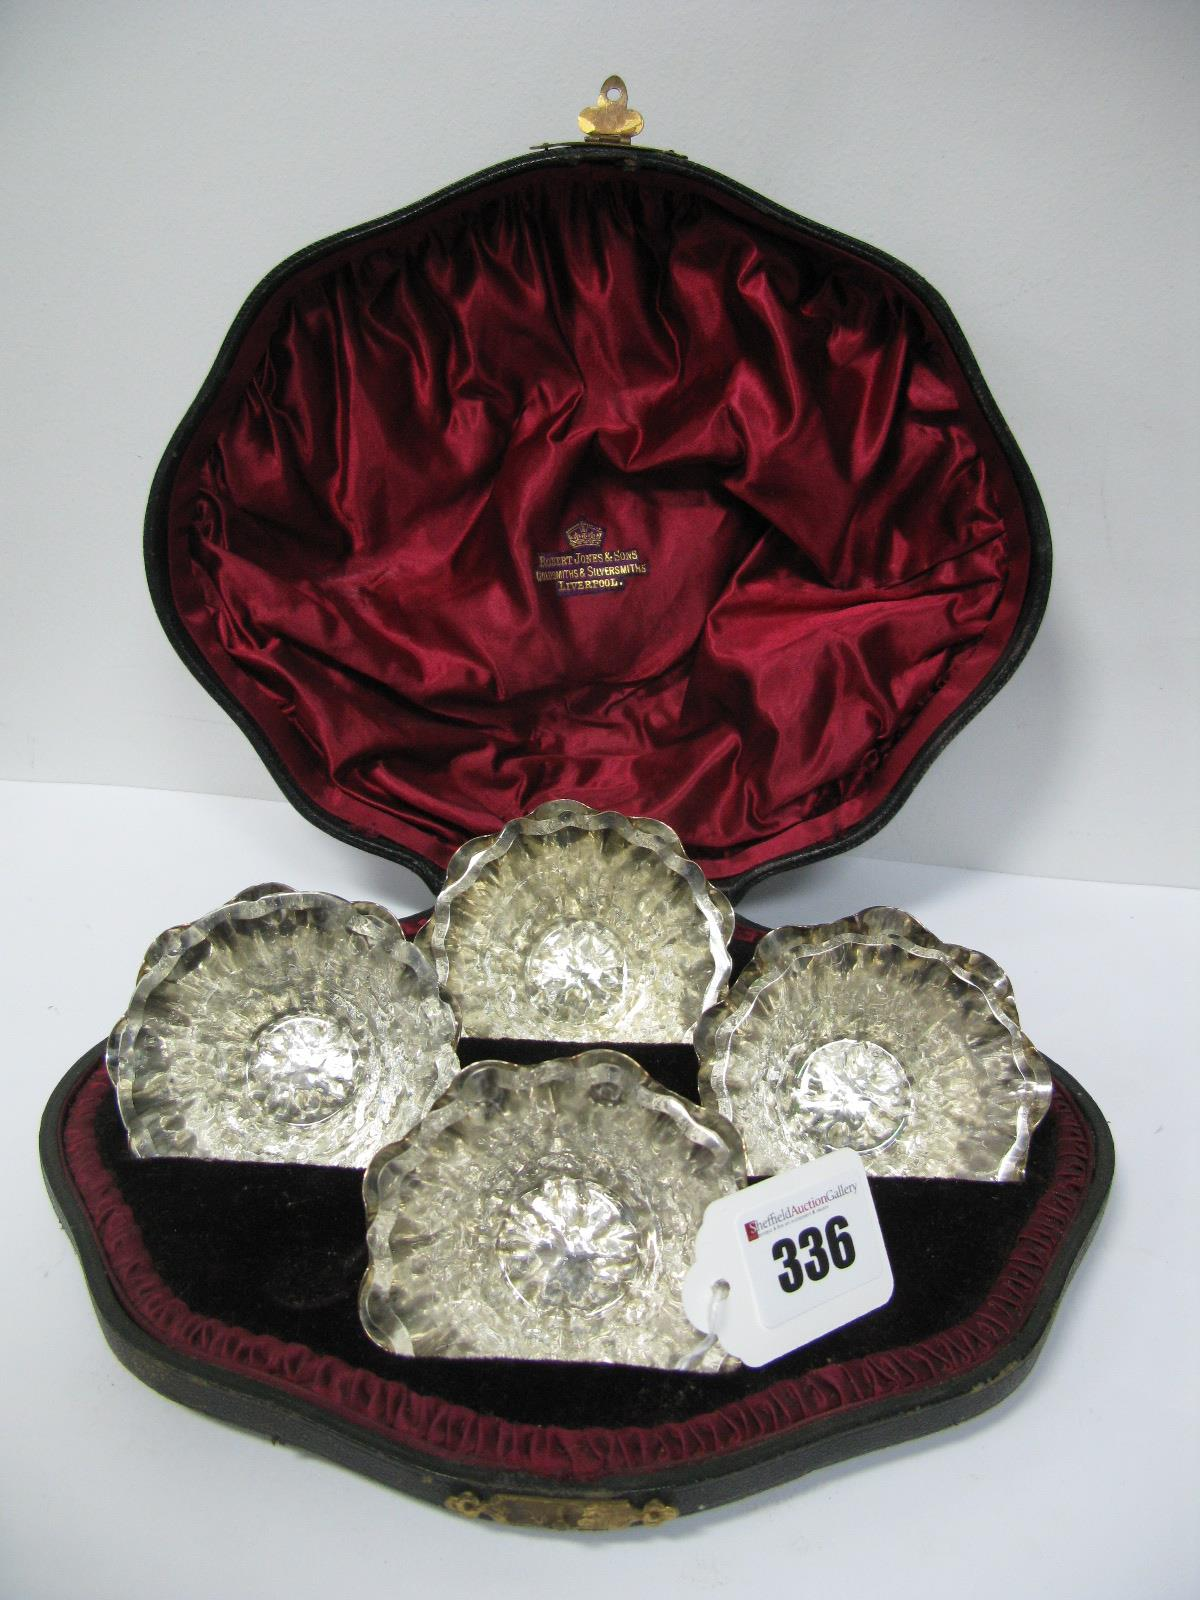 Lot 336 - A Set of Four Hallmarked Silver Salts, John Heath & John Middleton, of signature textured style,